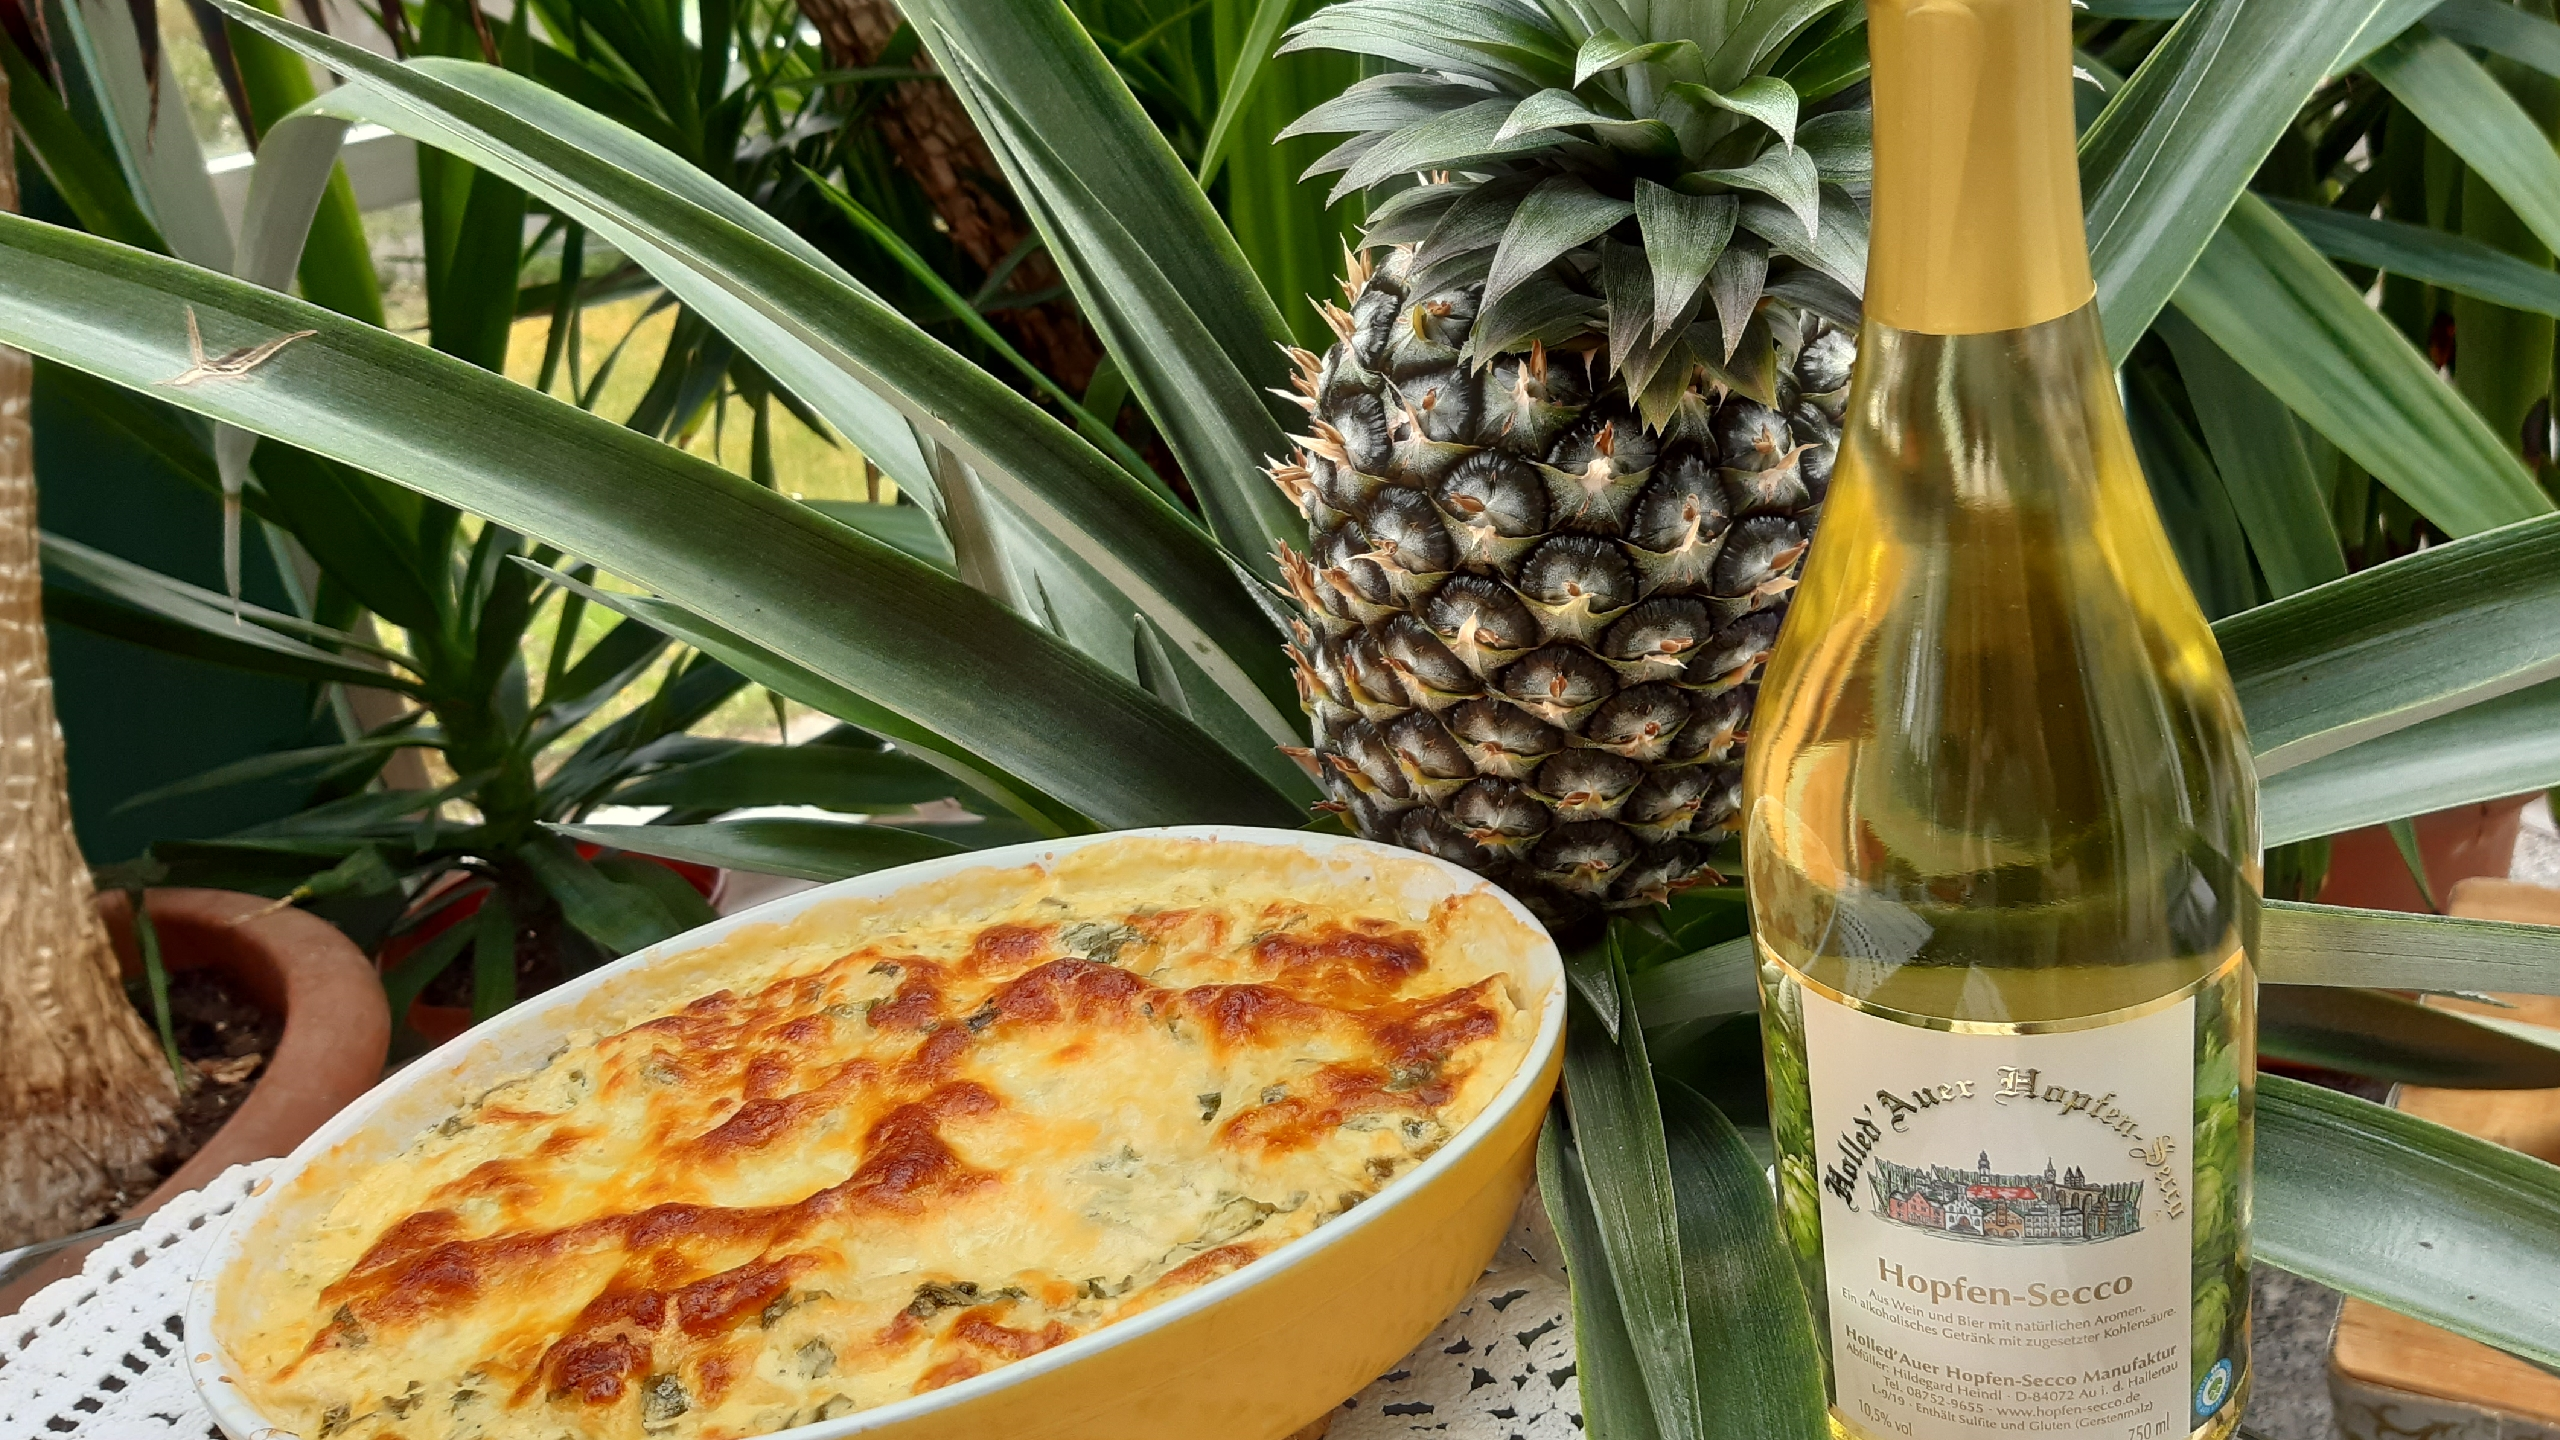 Ananas Lasagne mit Hopfen-Secco